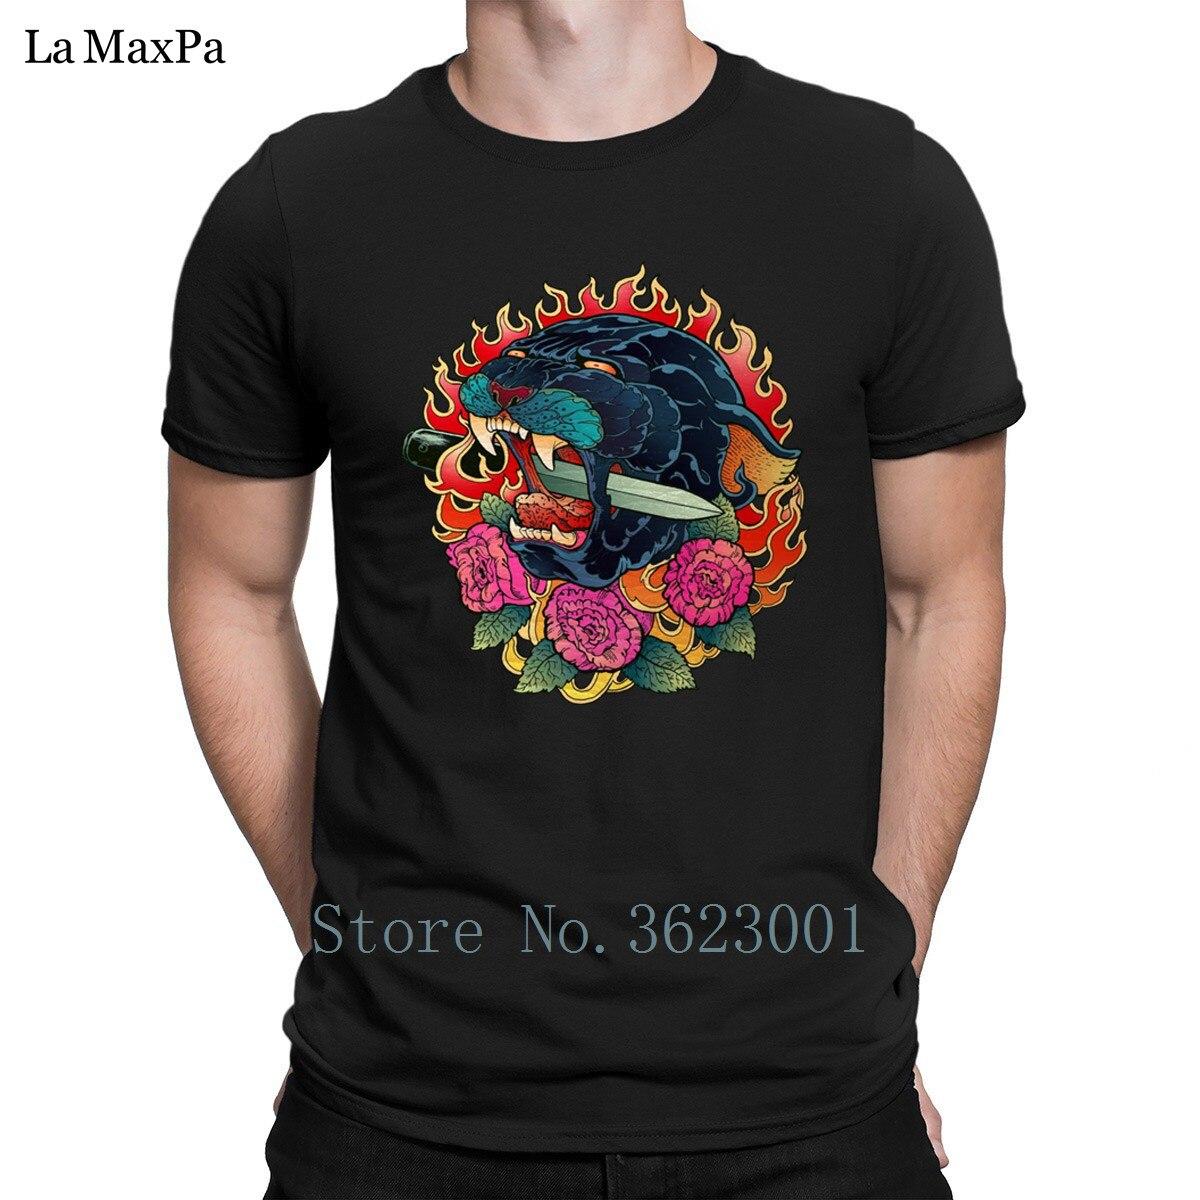 Design Funny Casual Tshirt For Men Burning Roses T Shirt Mens Clothes Tee Shirt Hilarious Men T-Shirt O-Neck HipHop Top